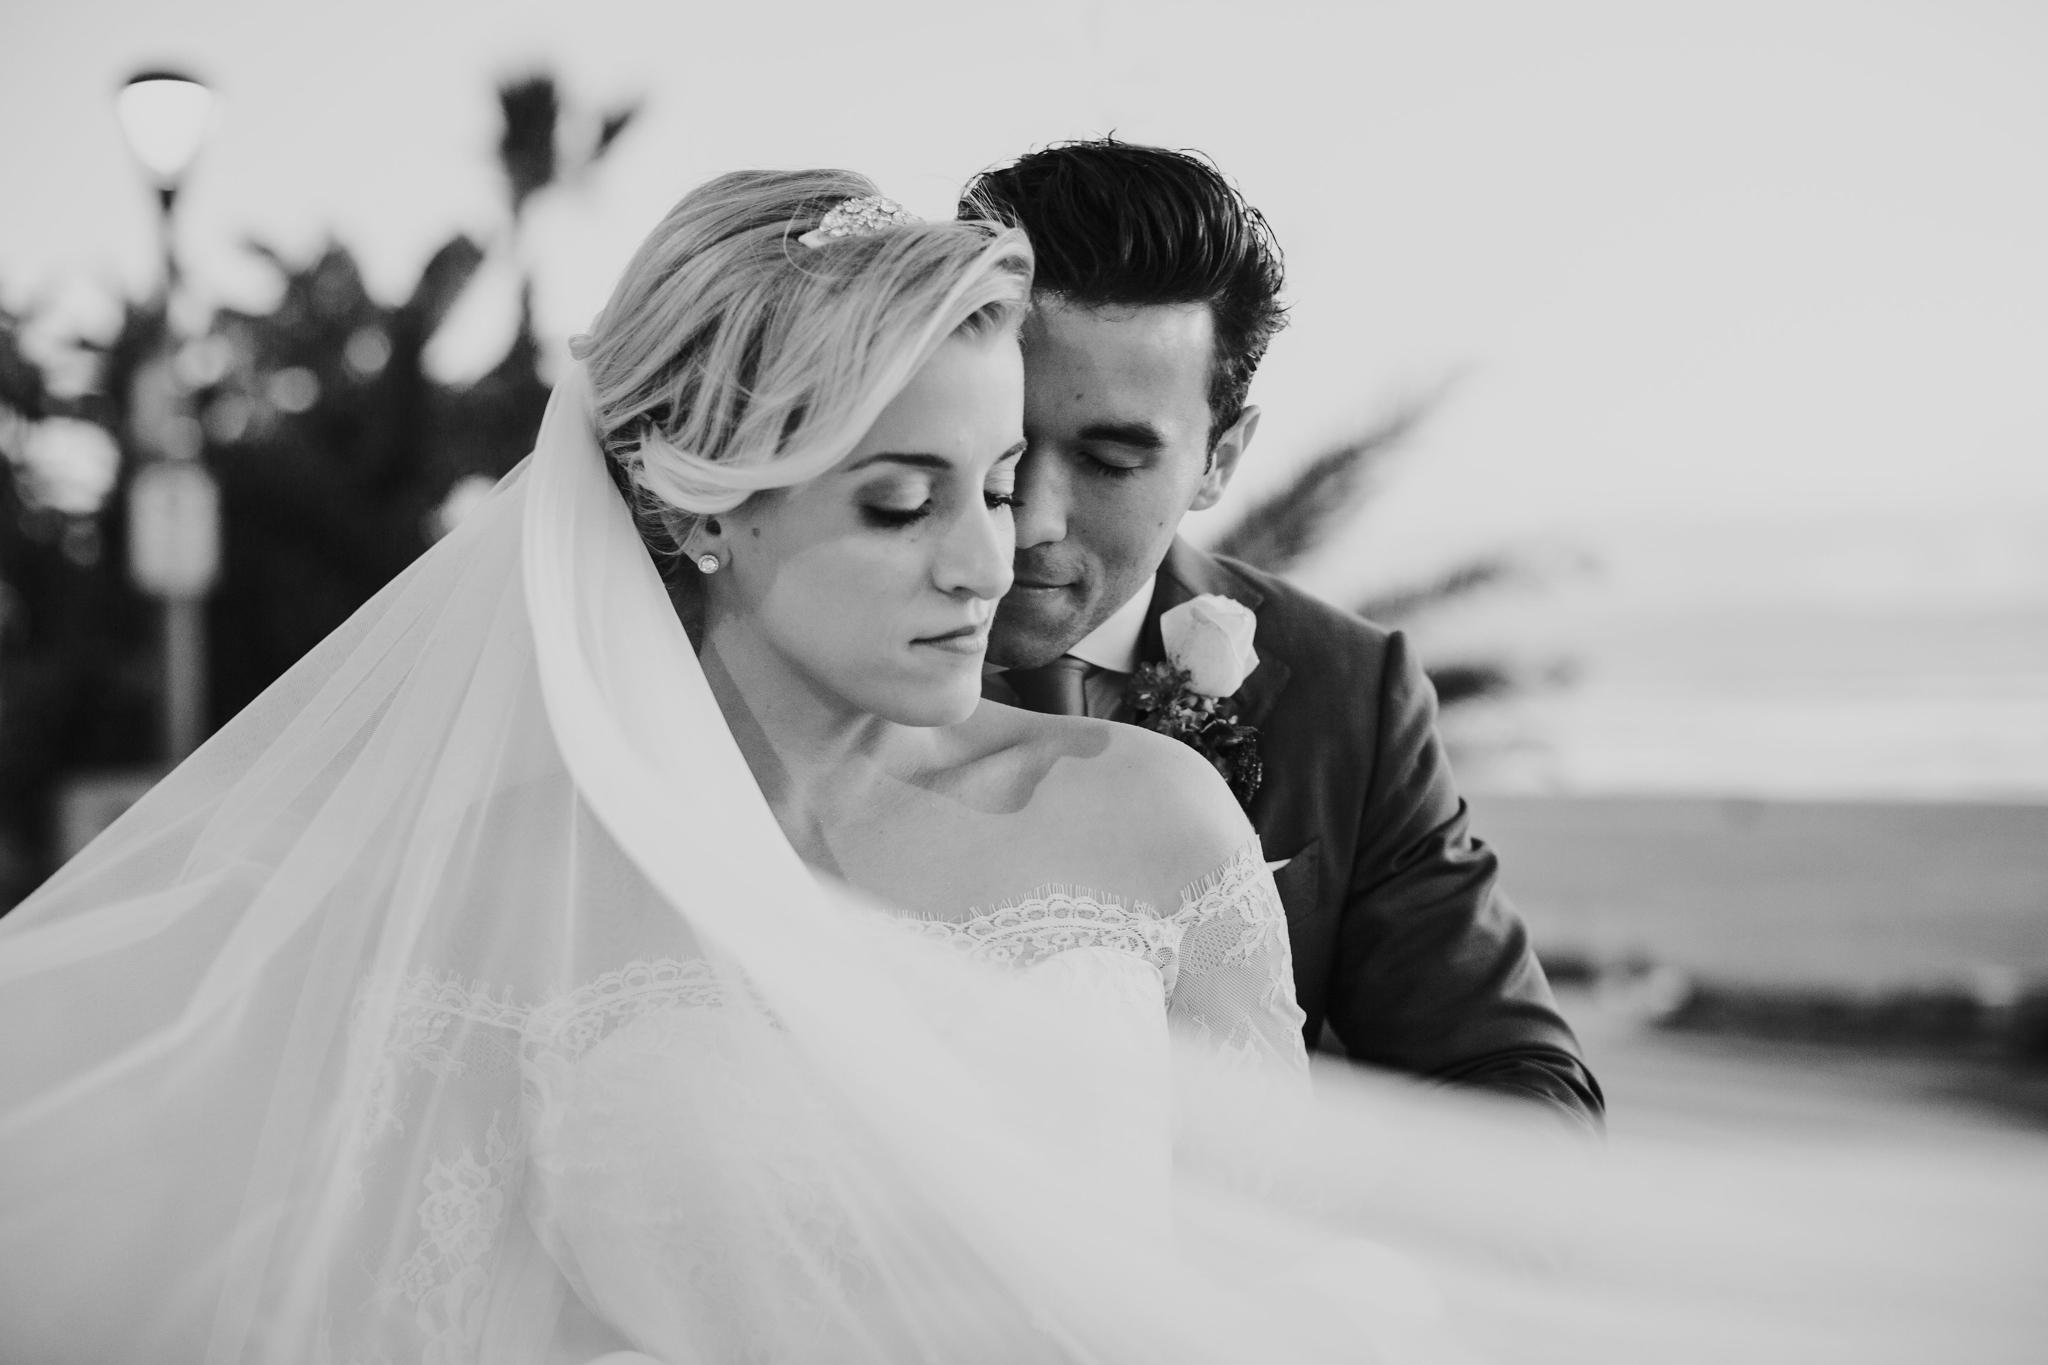 20151230_hussem_wedding_0704_web.jpg